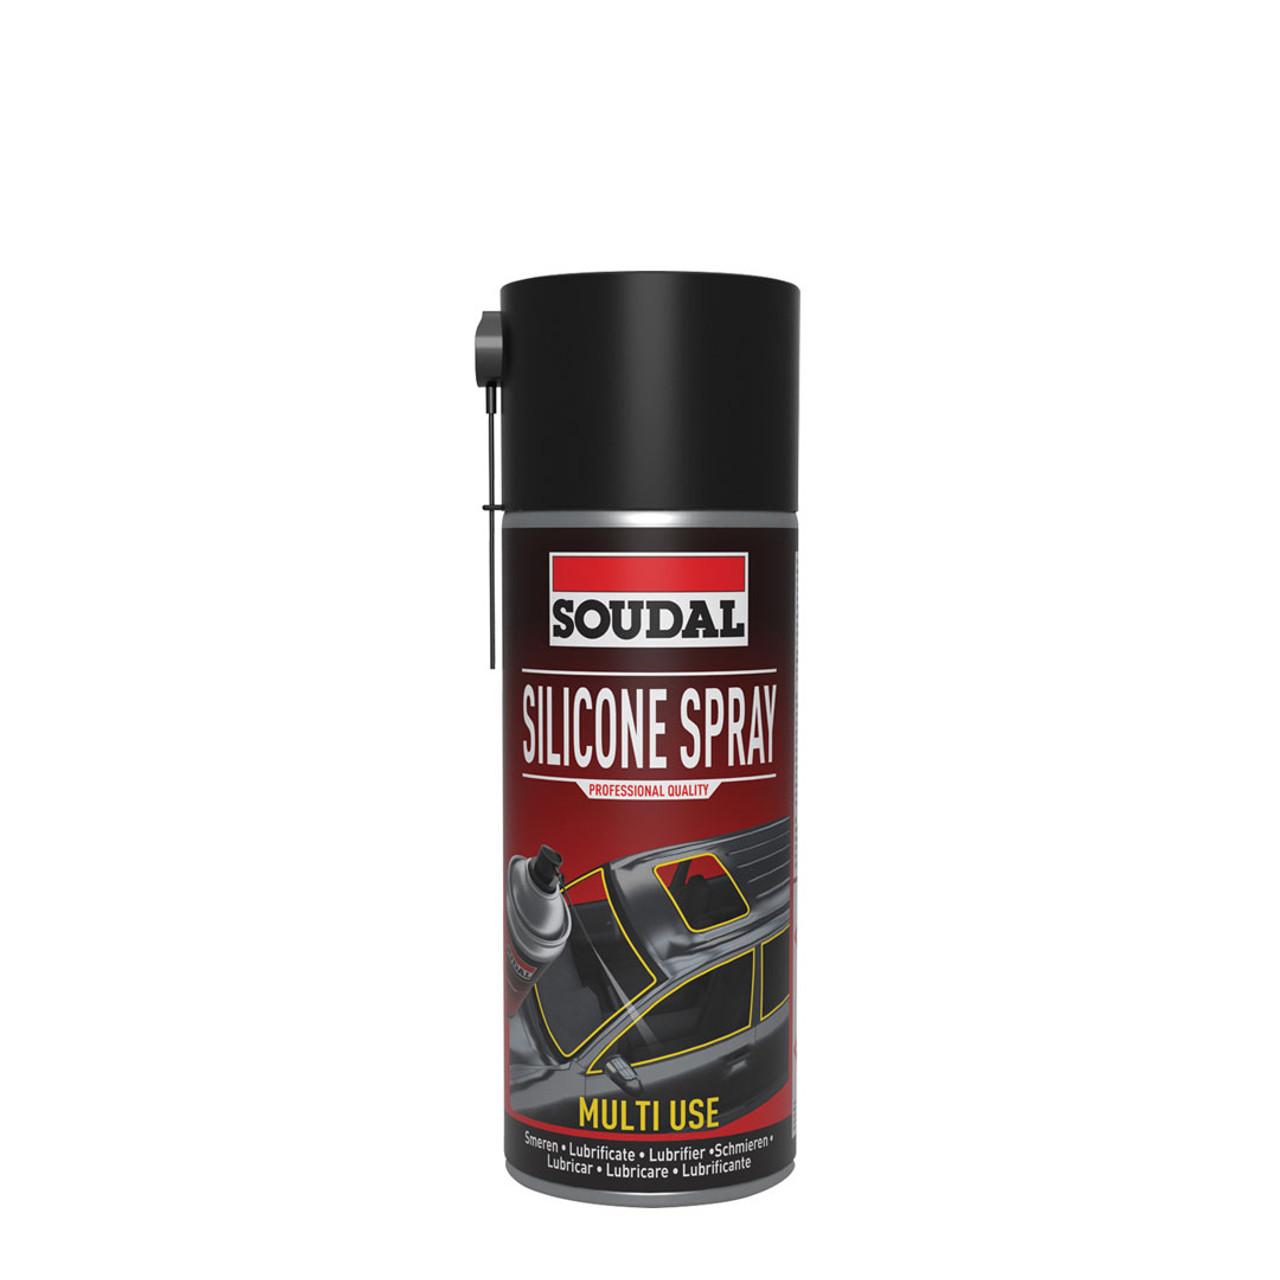 Soudal Silicone Spray Multi-use 400ml